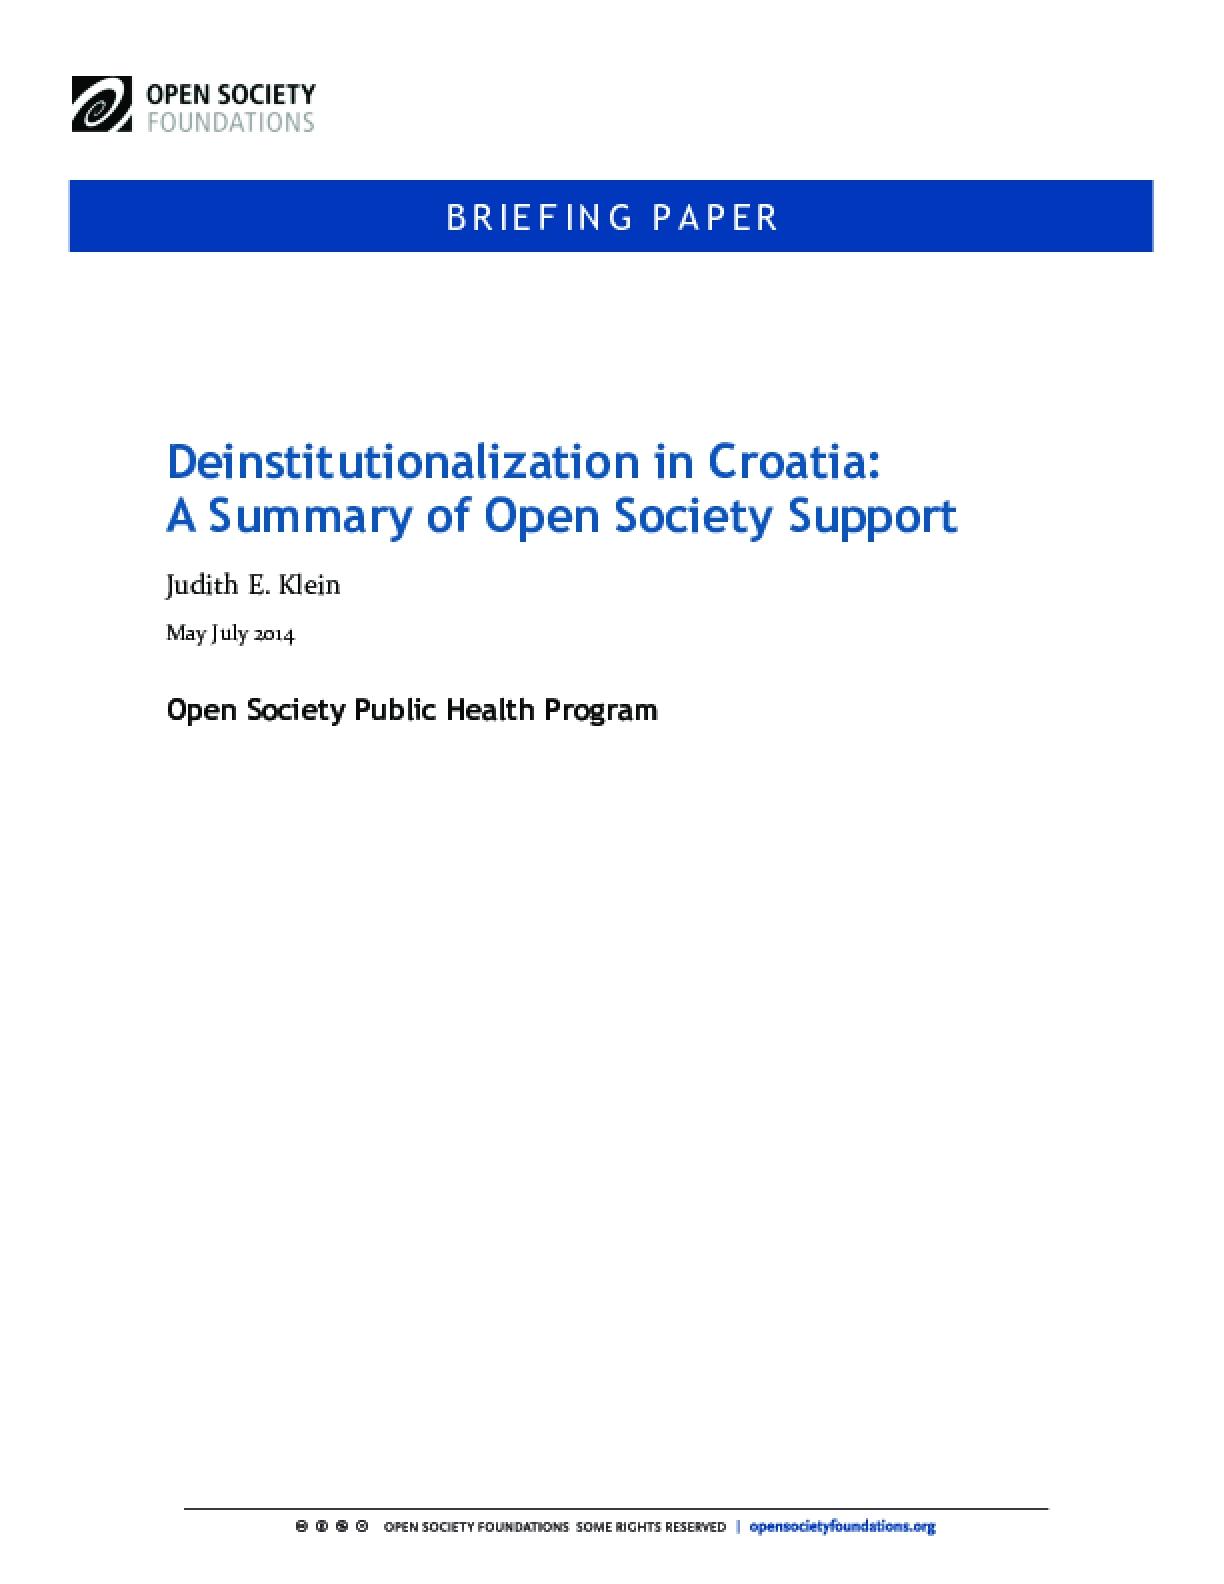 Deinstitutionalization in Croatia